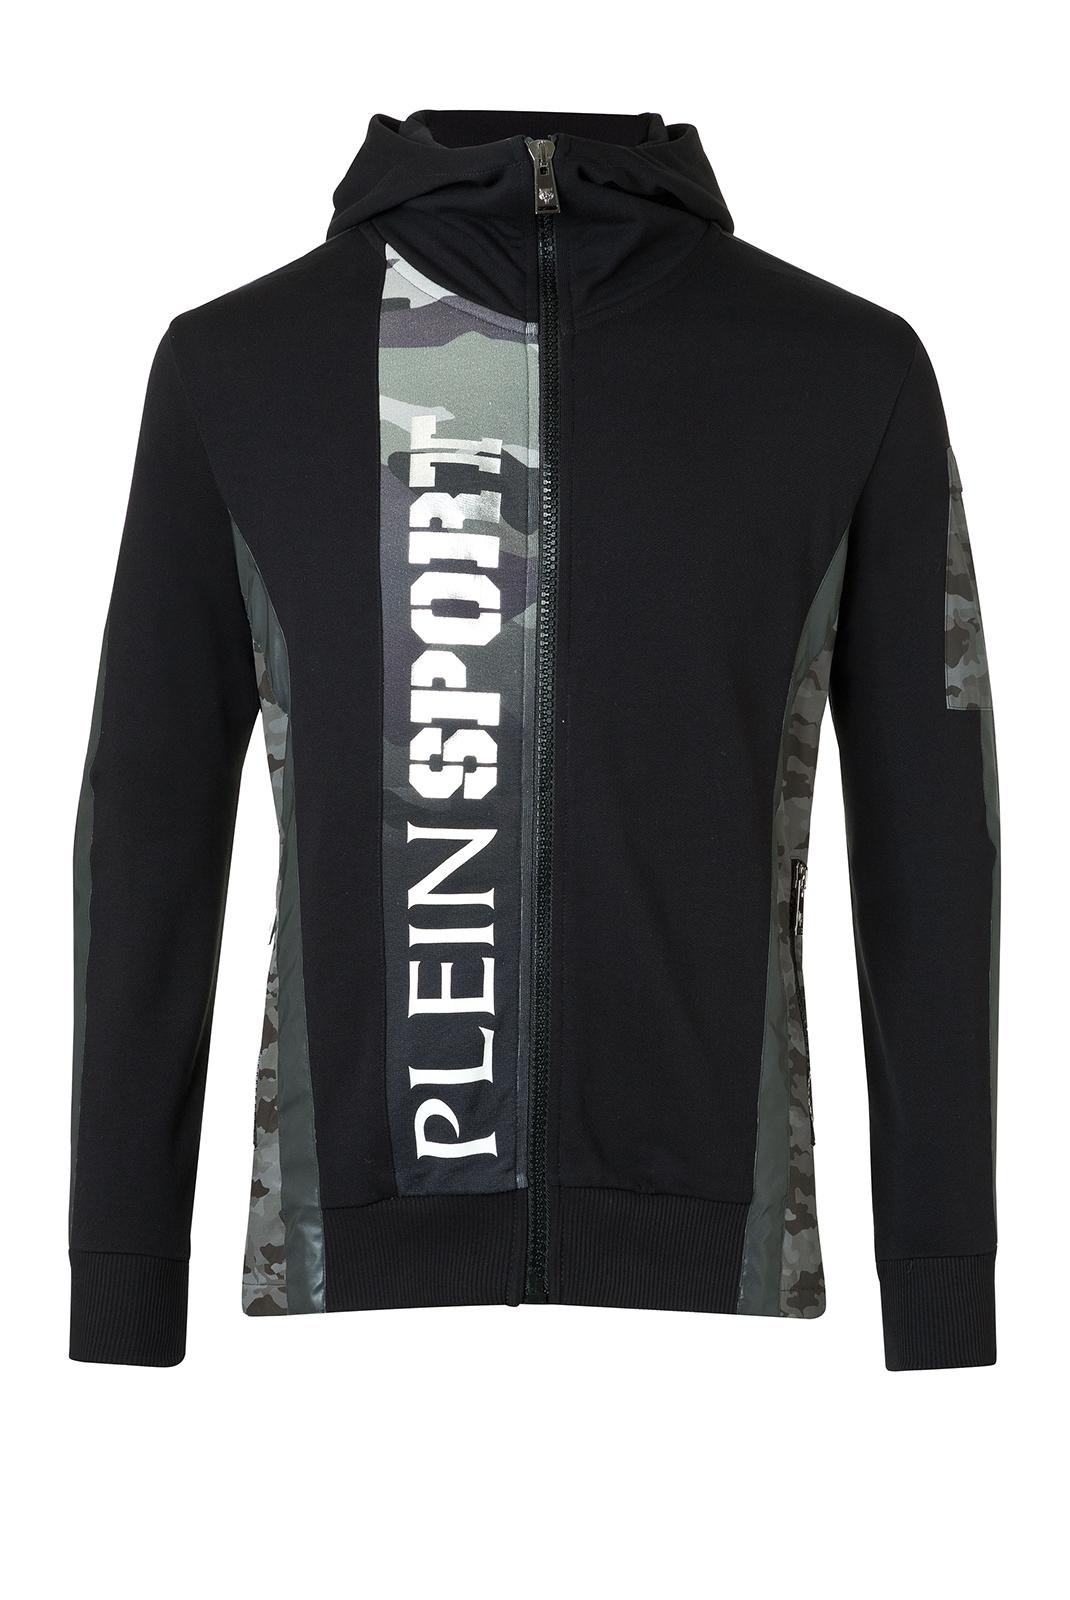 Vestes zippées  Plein Sport MJB0113 SILVER 0210 BLACK/SILVER